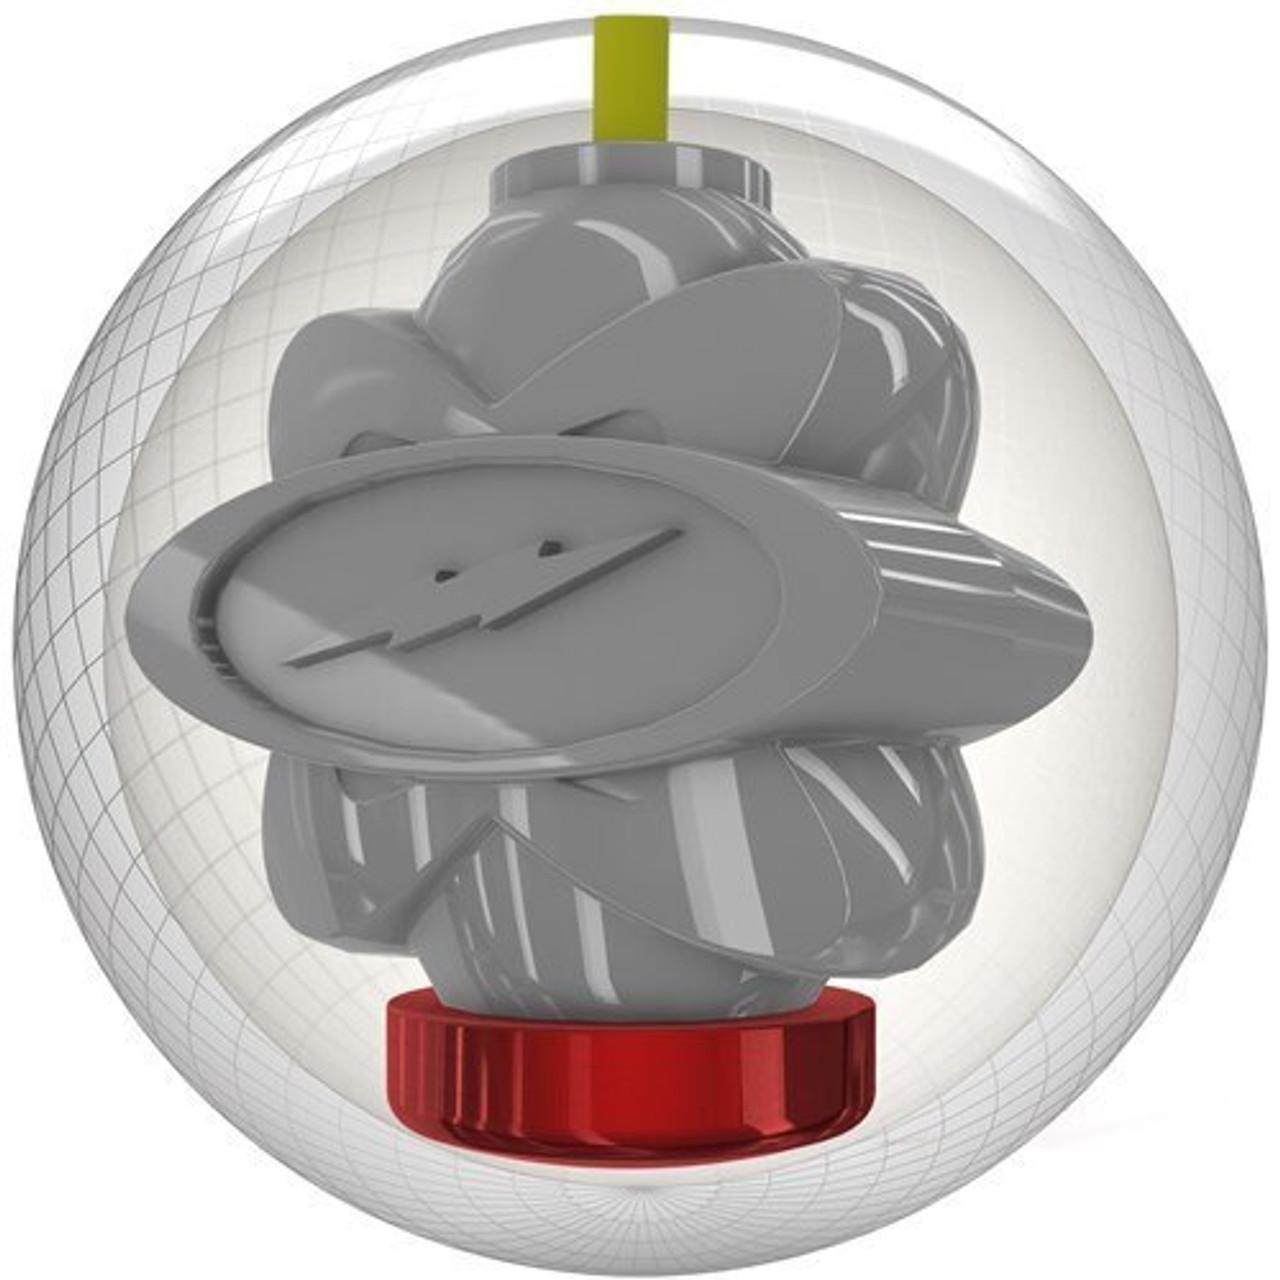 Storm Proton Physix Bowling Ball Core